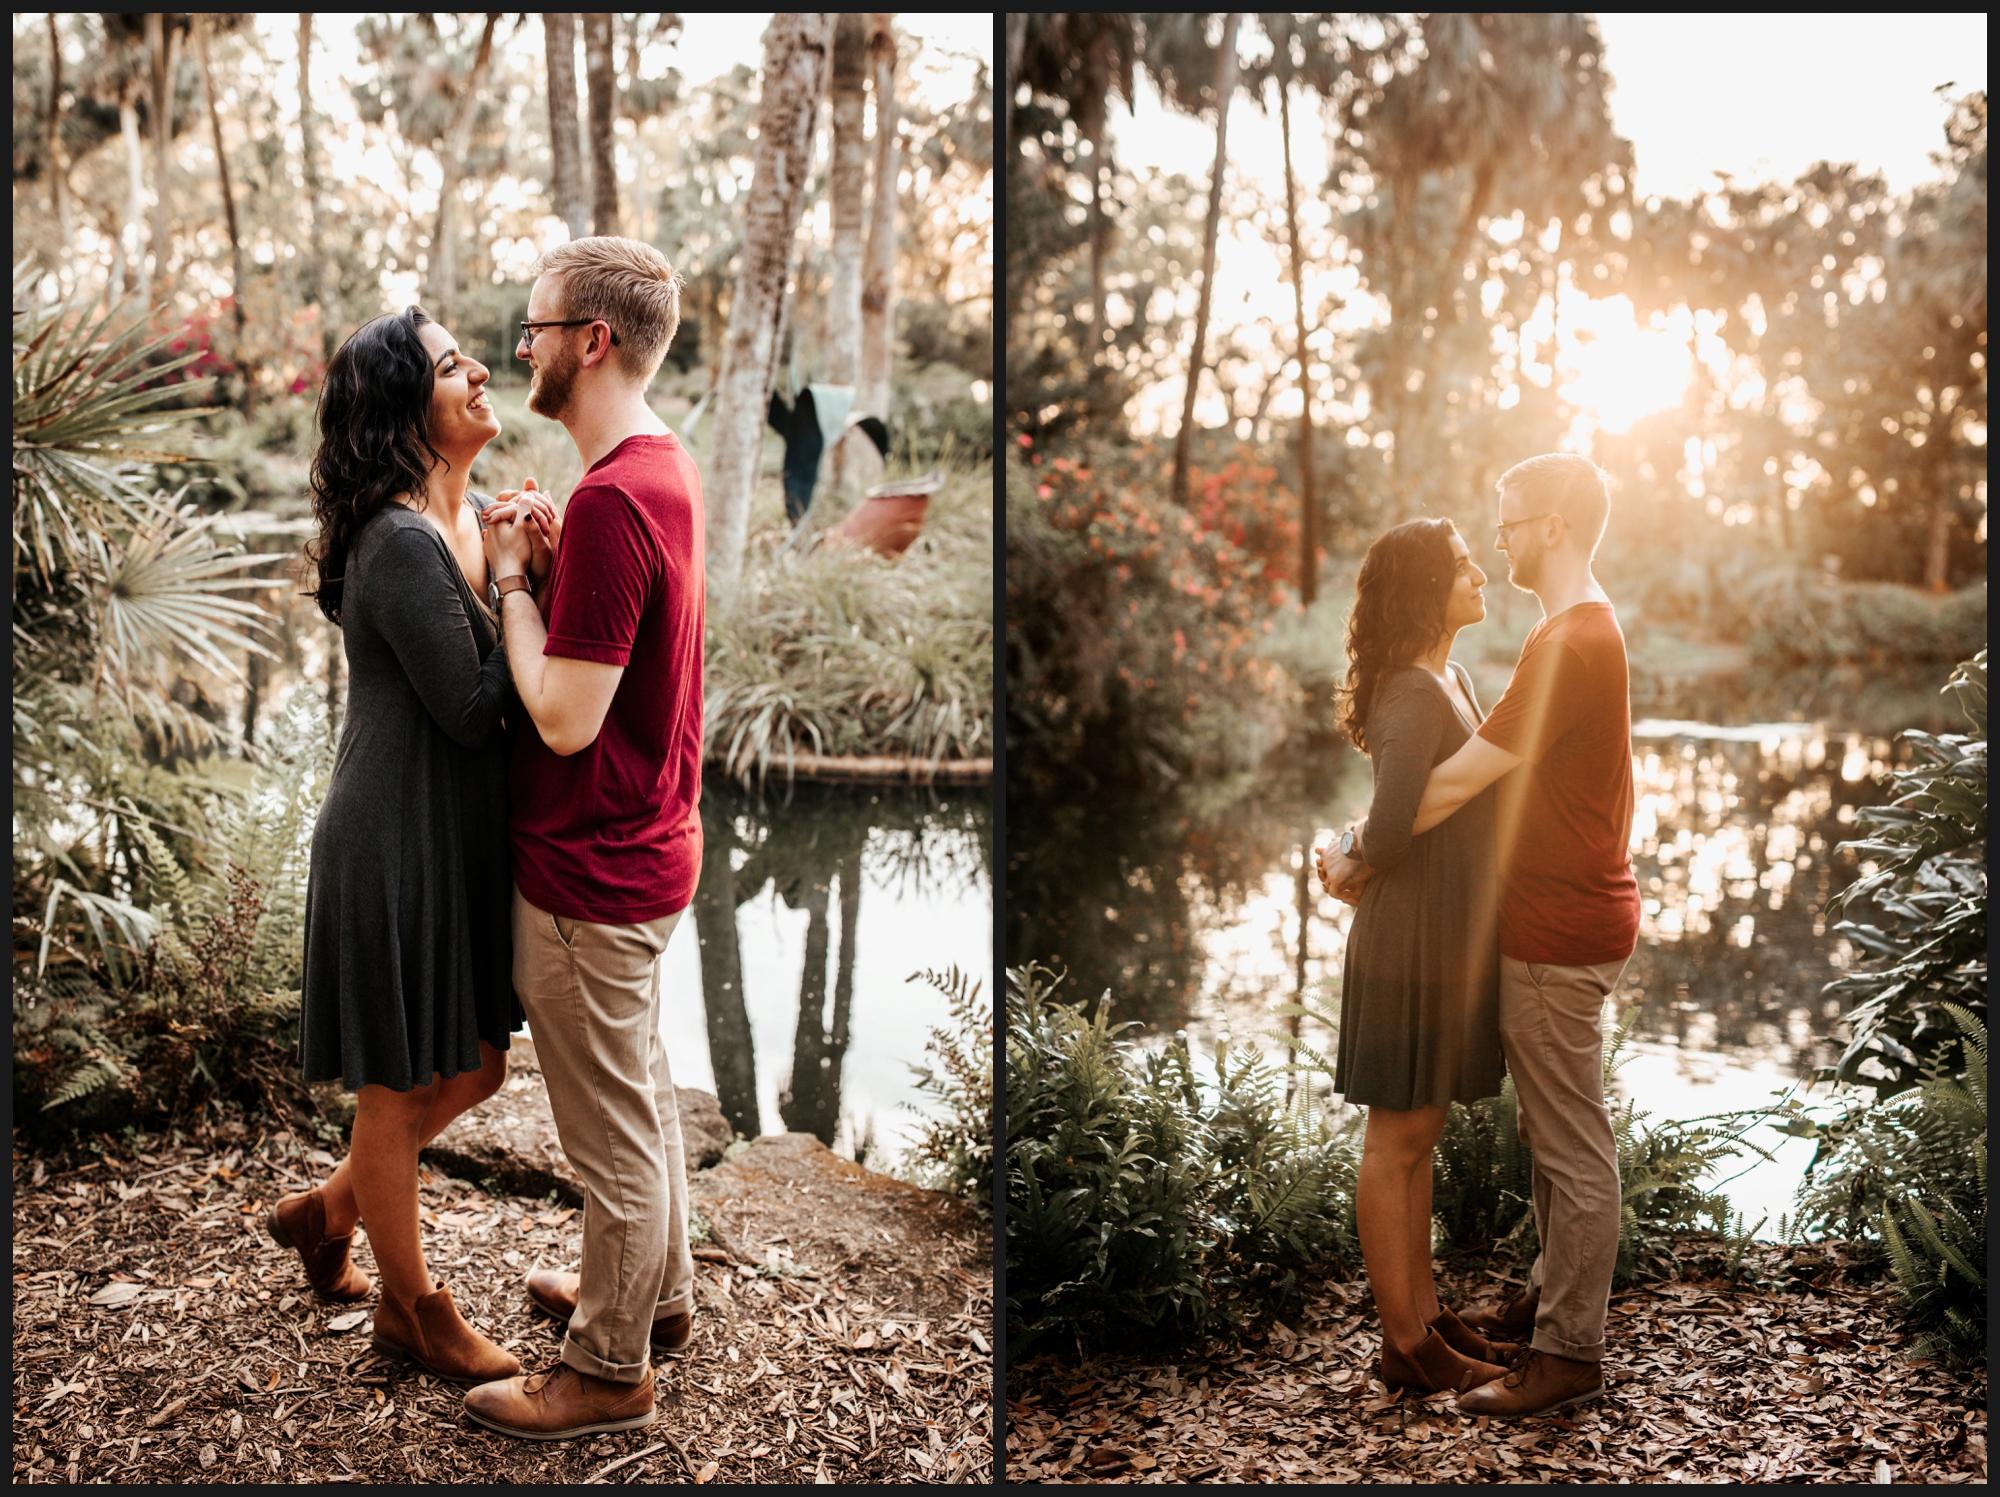 Orlando-Wedding-Photographer-destination-wedding-photographer-florida-wedding-photographer-bohemian-wedding-photographer_1793.jpg